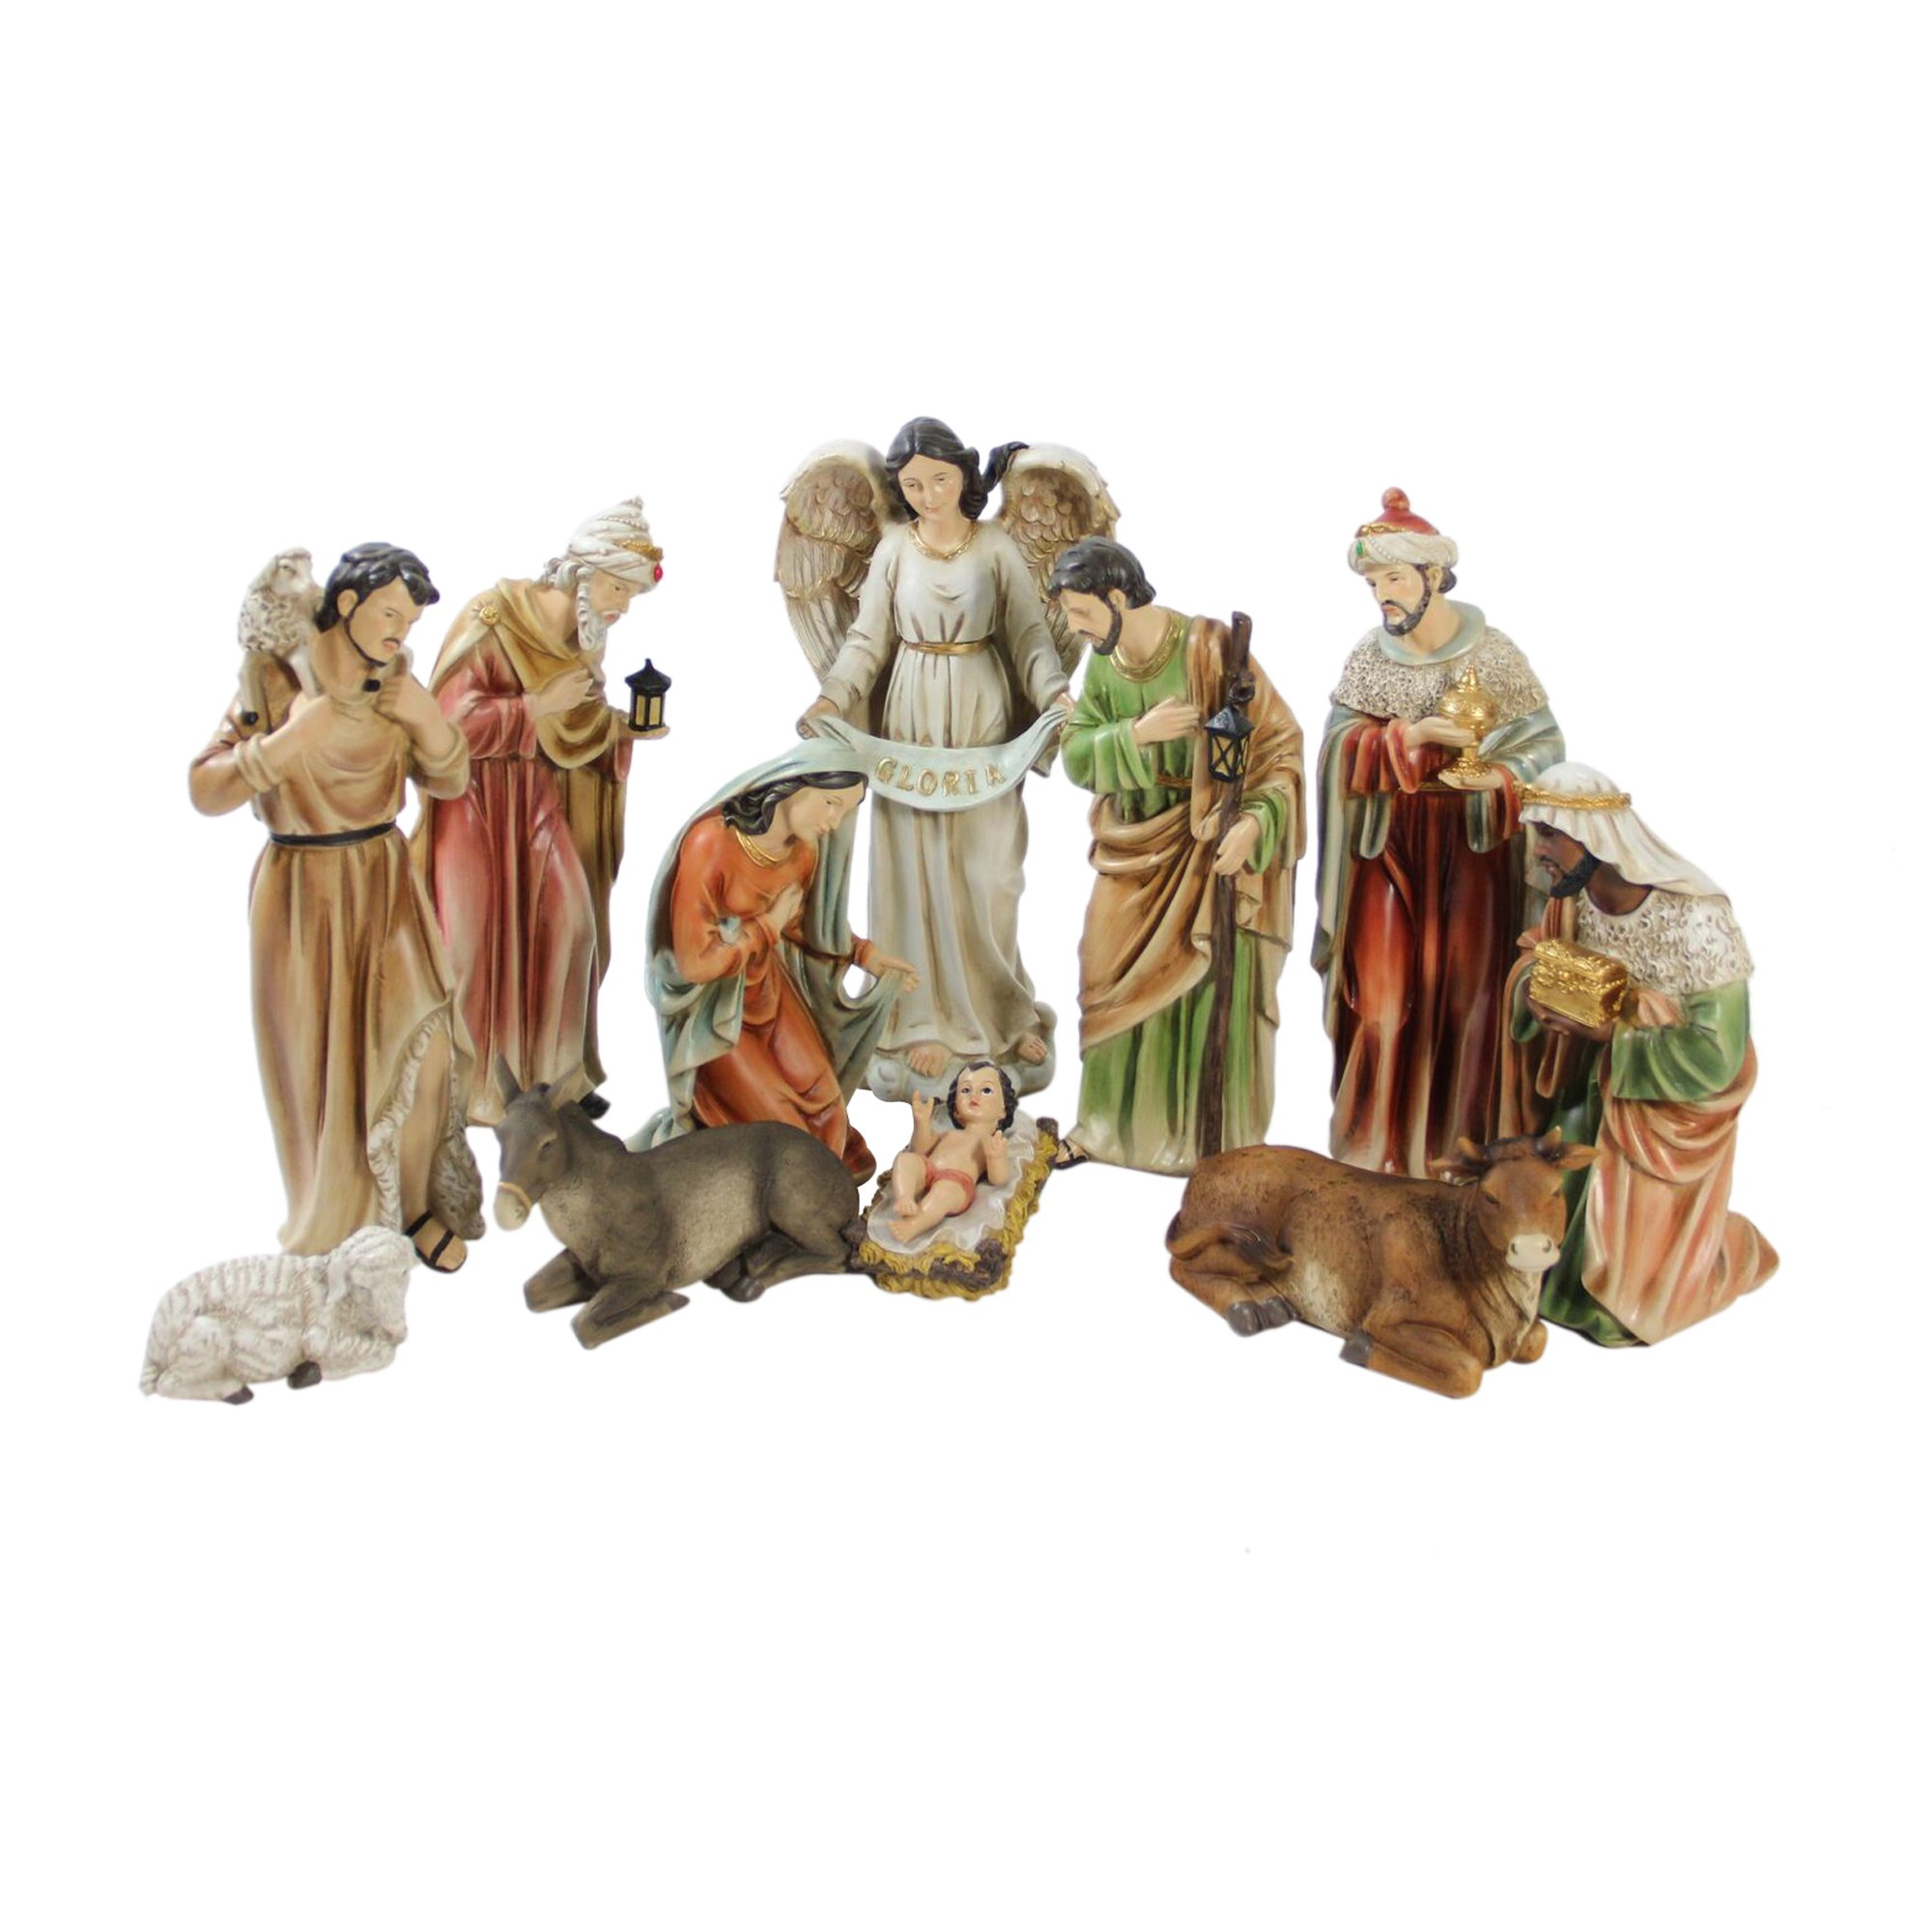 11 Piece Traditional Religious